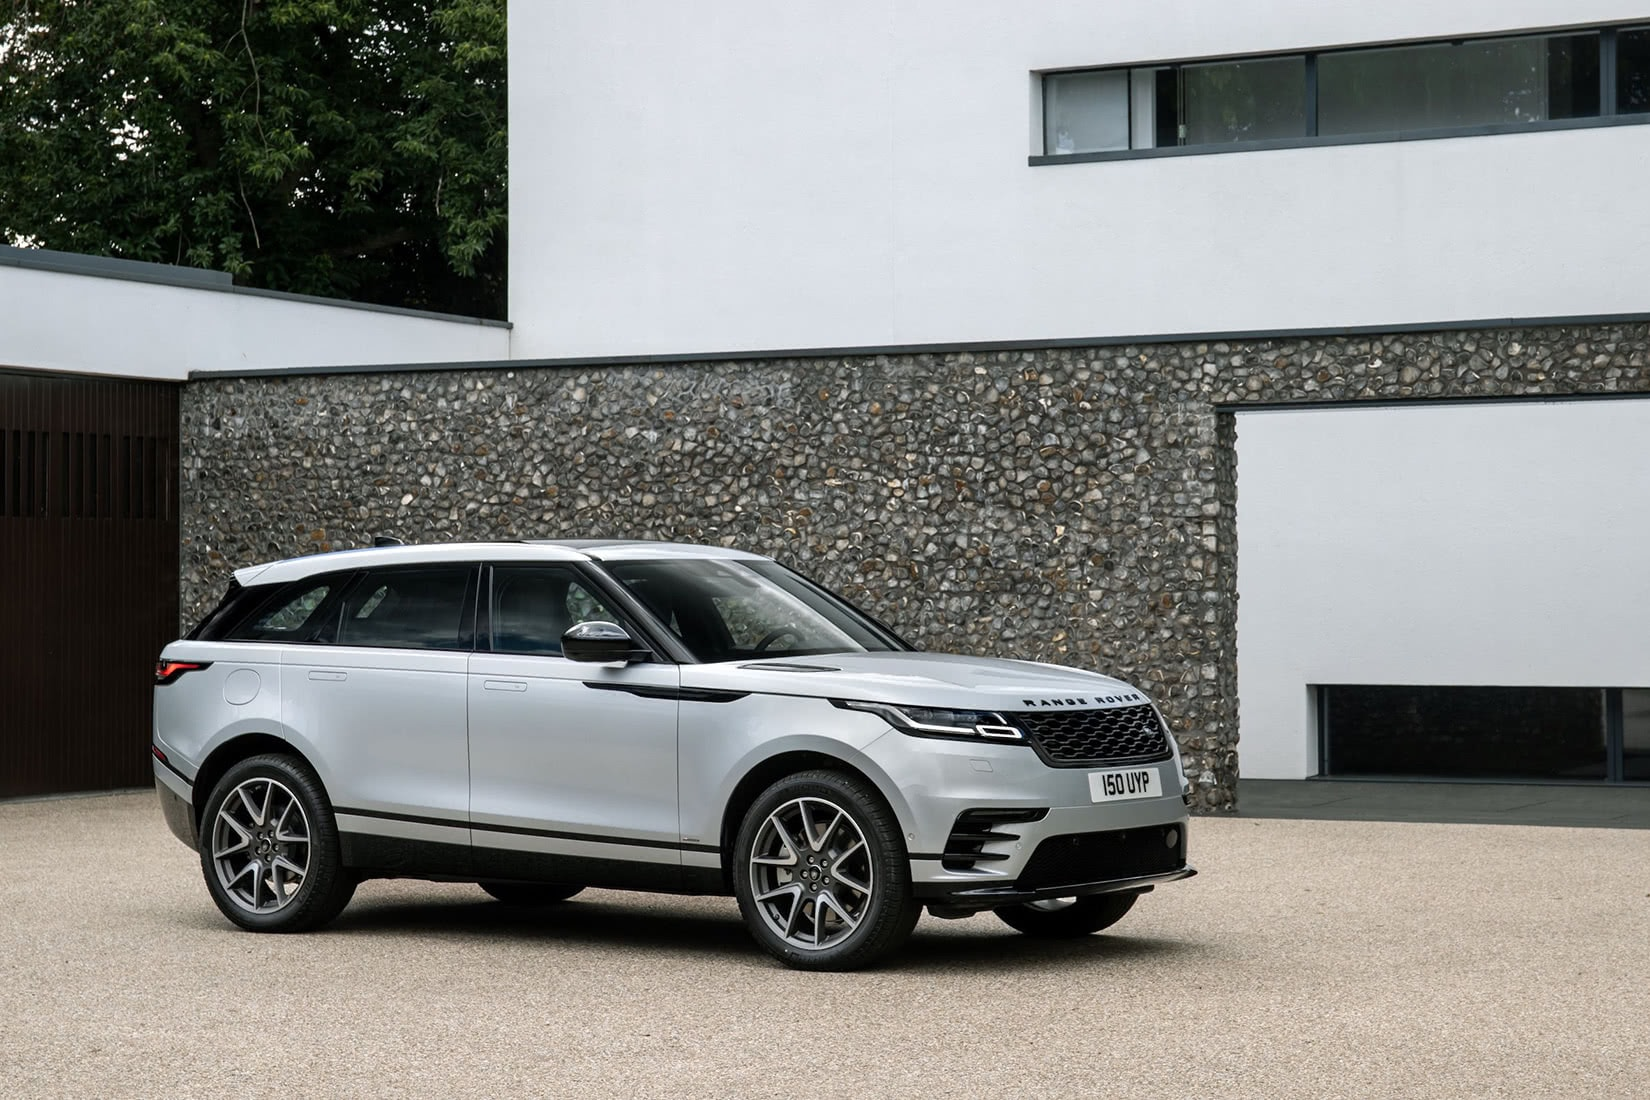 best luxury car brand Land Rover - Luxe Digital